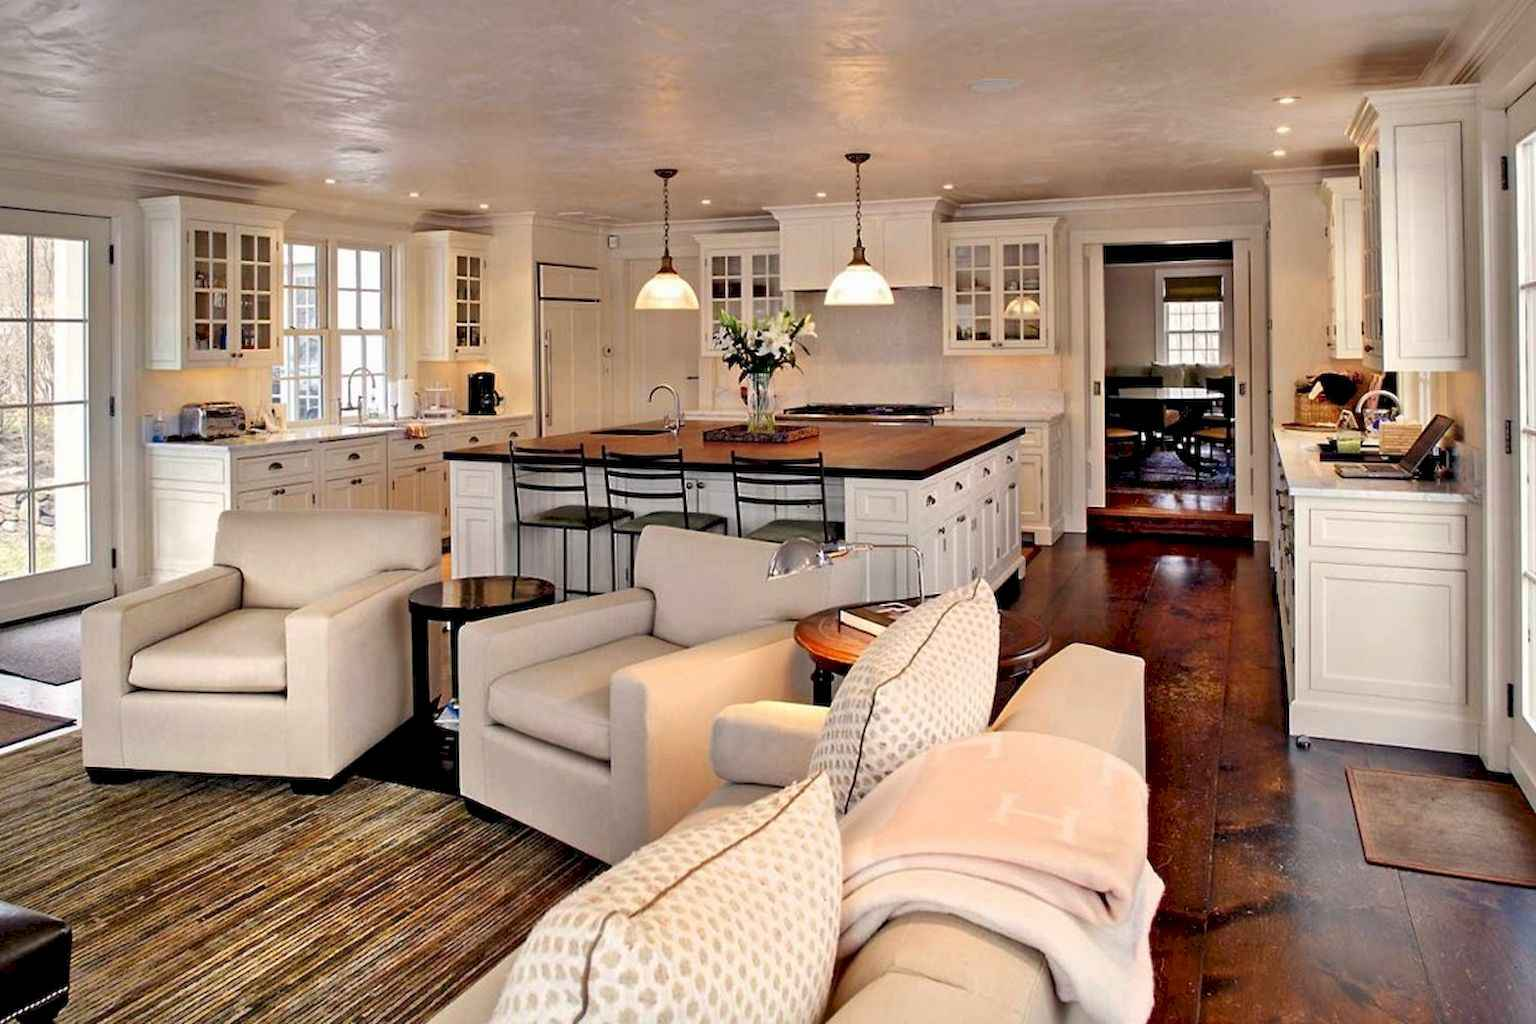 70 Rustic Farmhouse Living Room Decor Ideas (57)